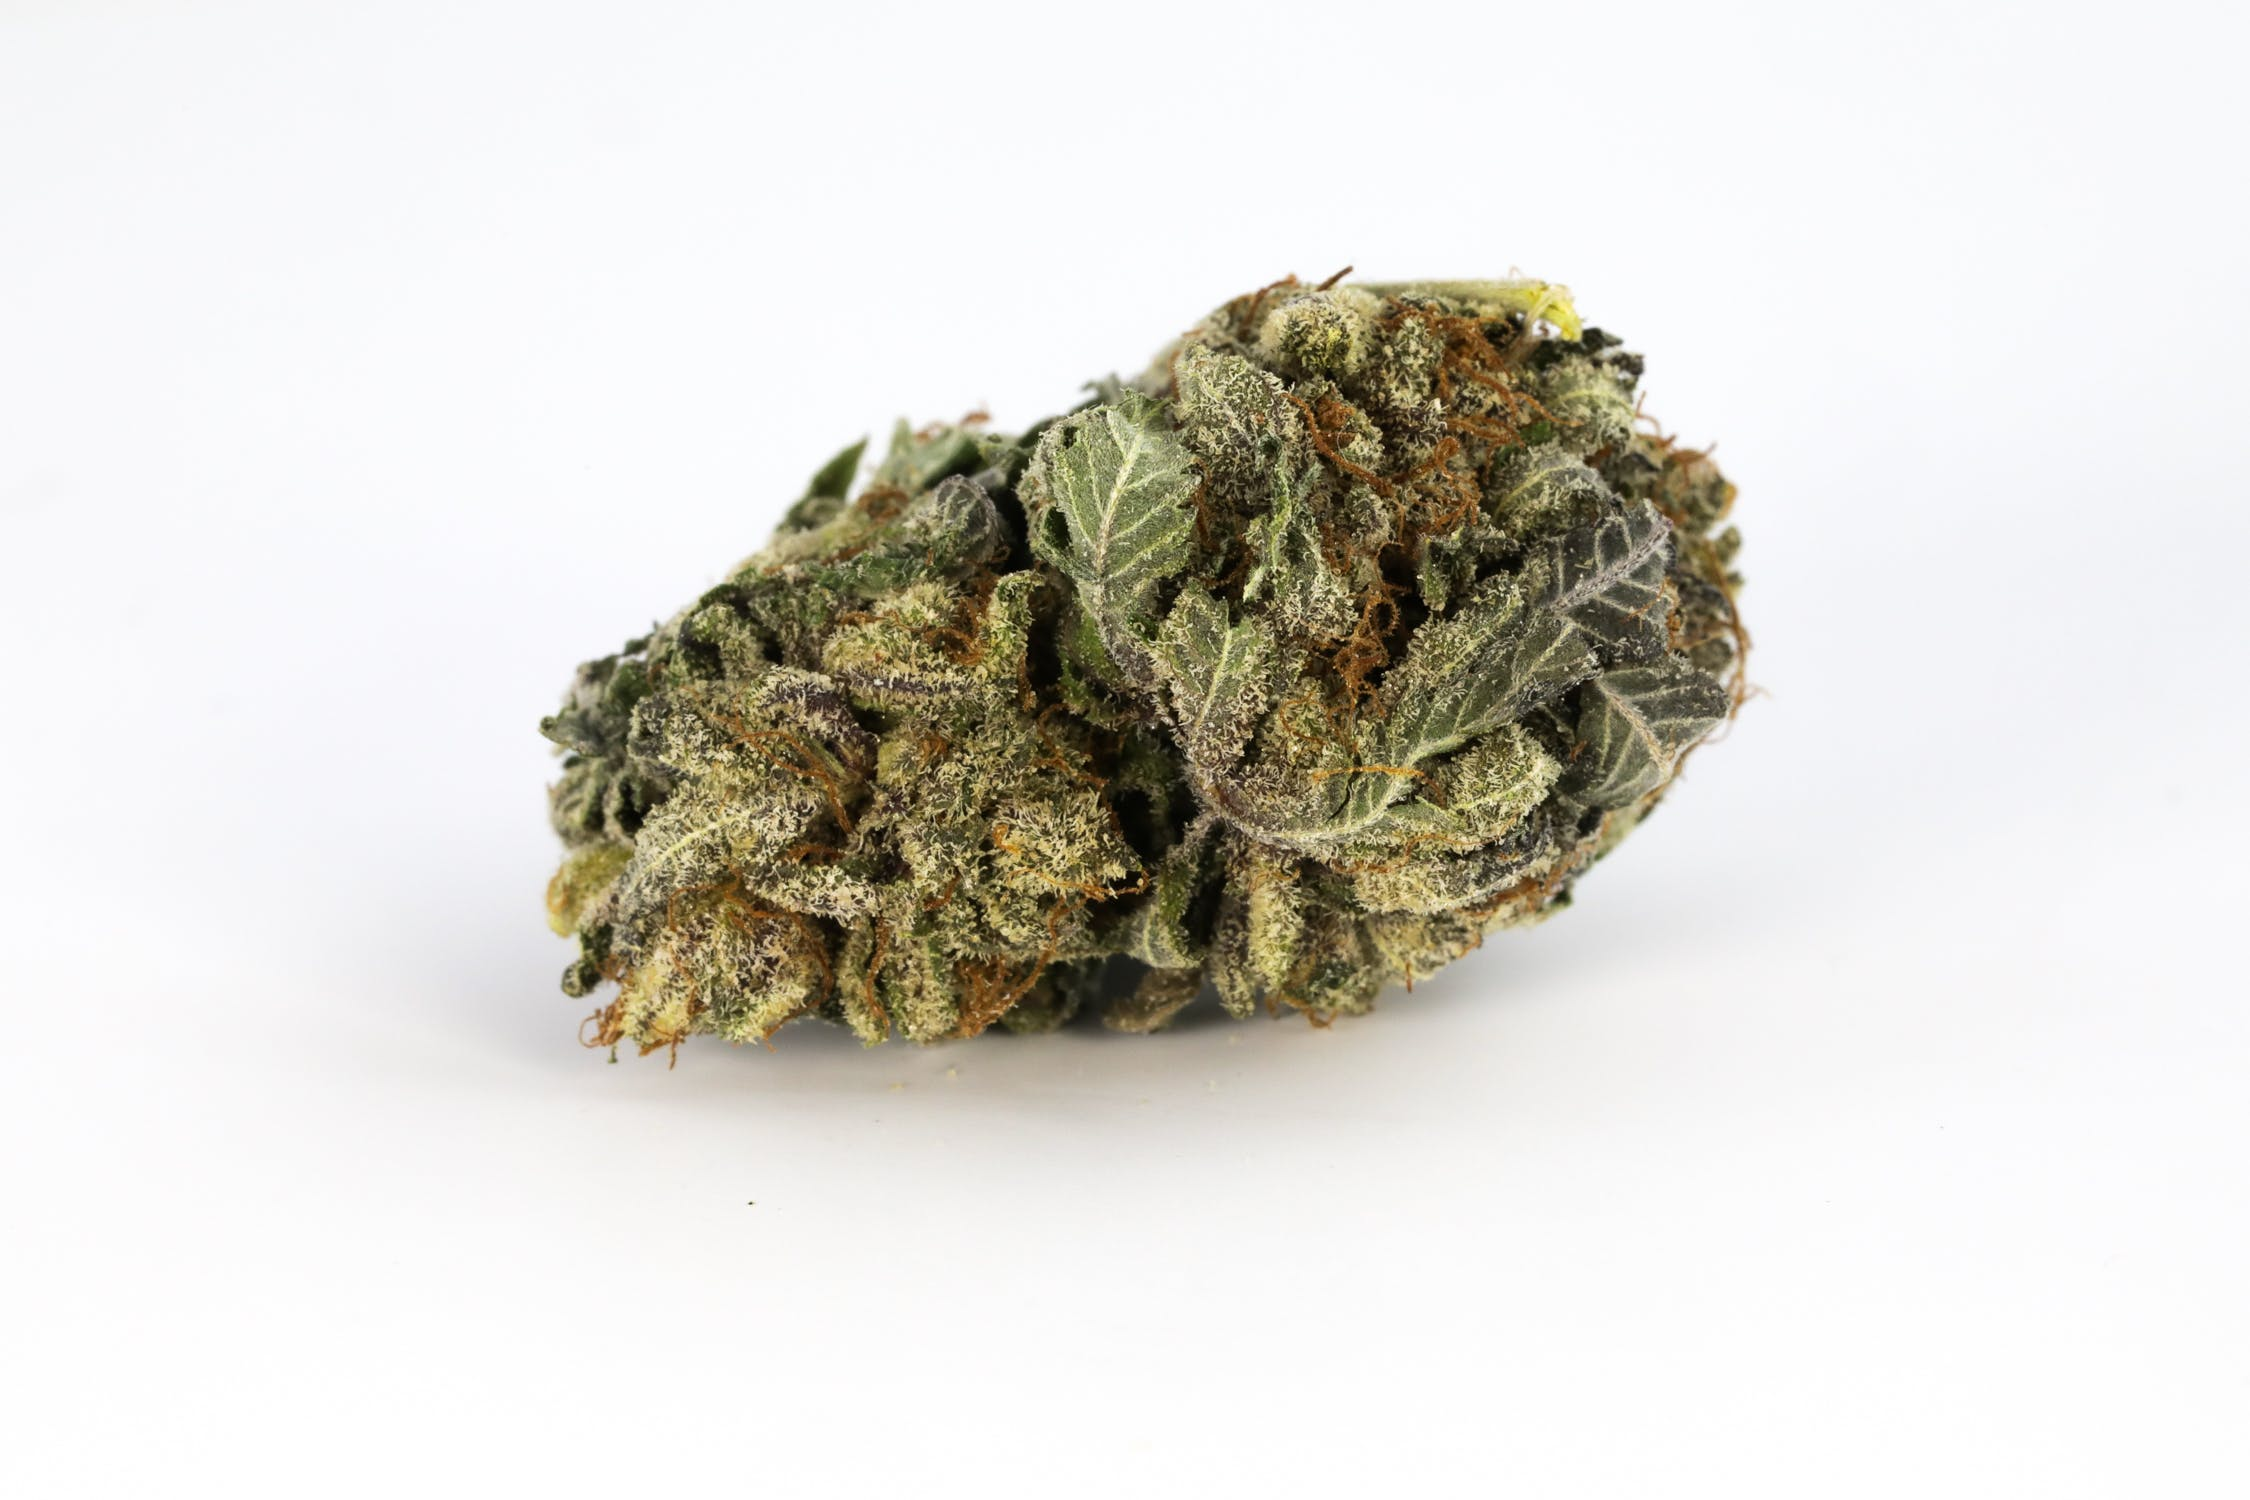 ACDC Congress Blocks Recreational Marijuana Sales In Washington, D.C.